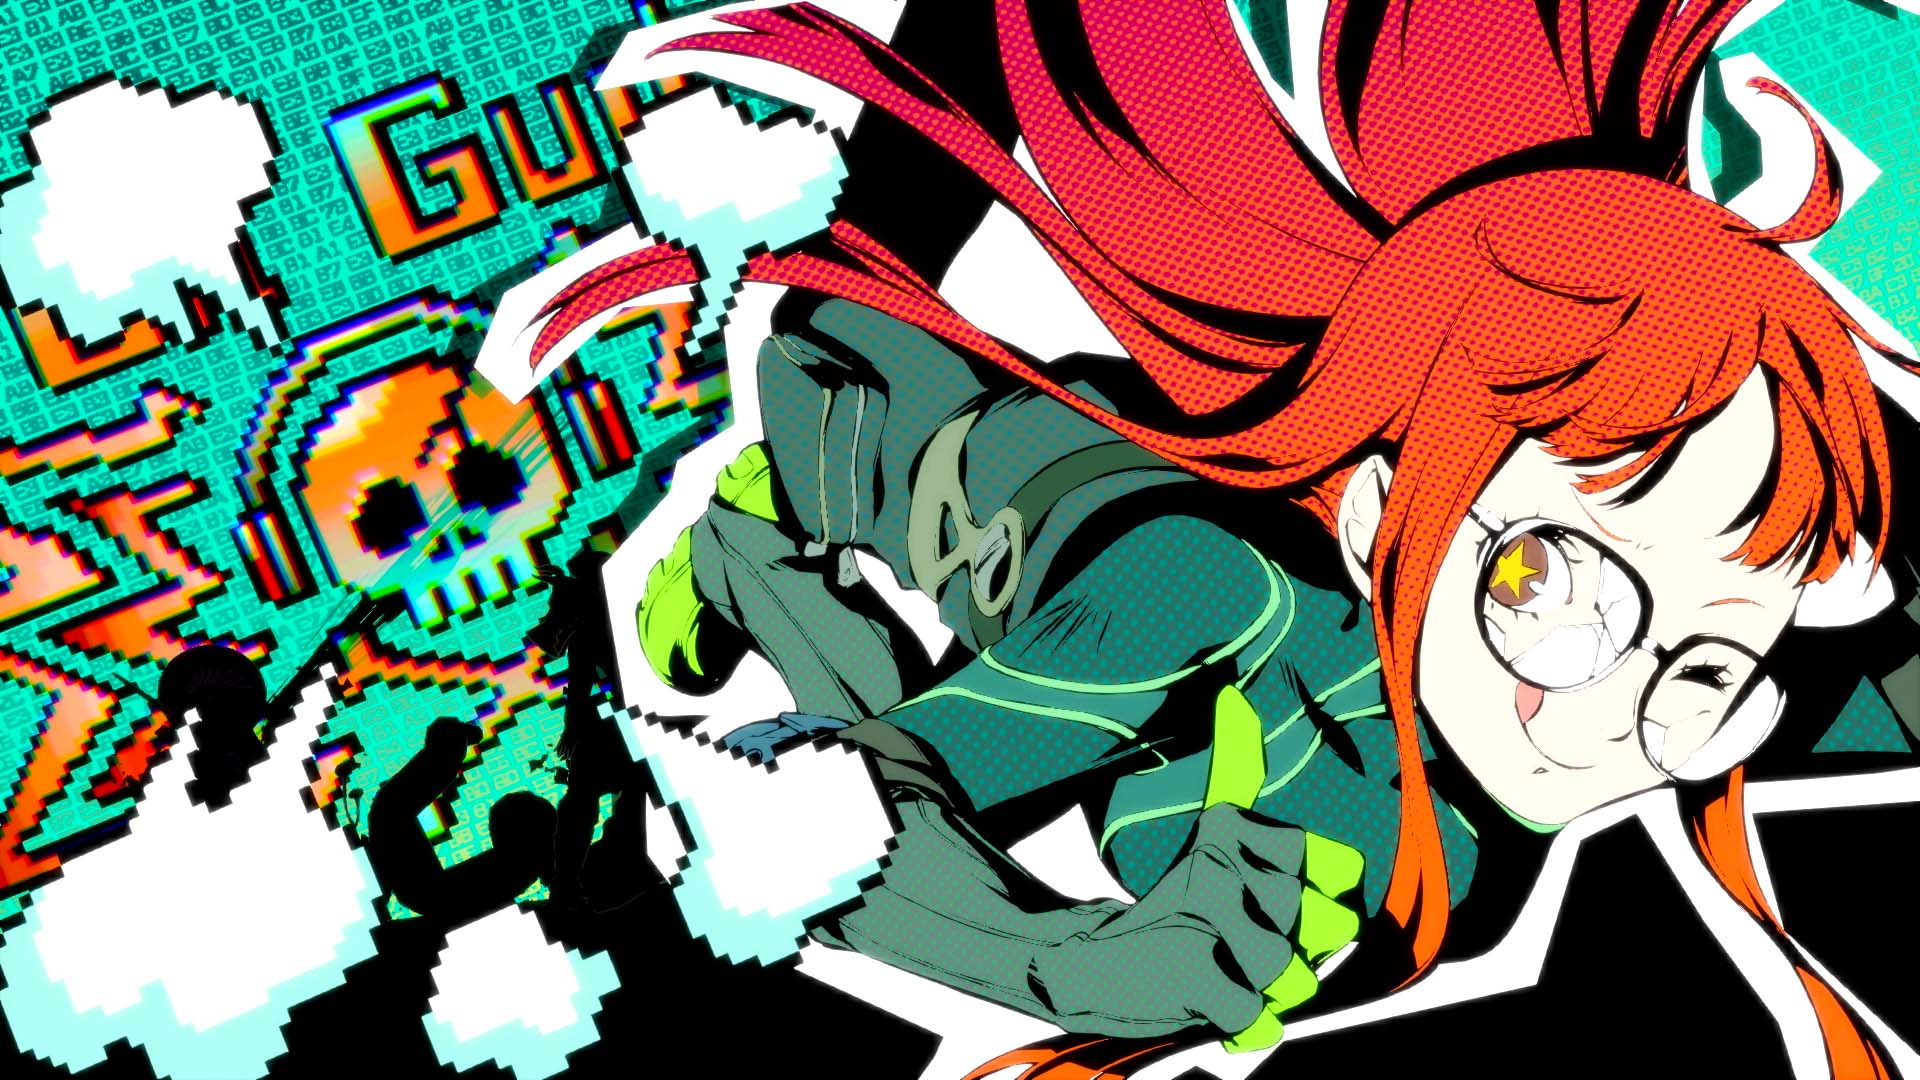 Artwork Phantom Thieves - Persona 5 Atlus